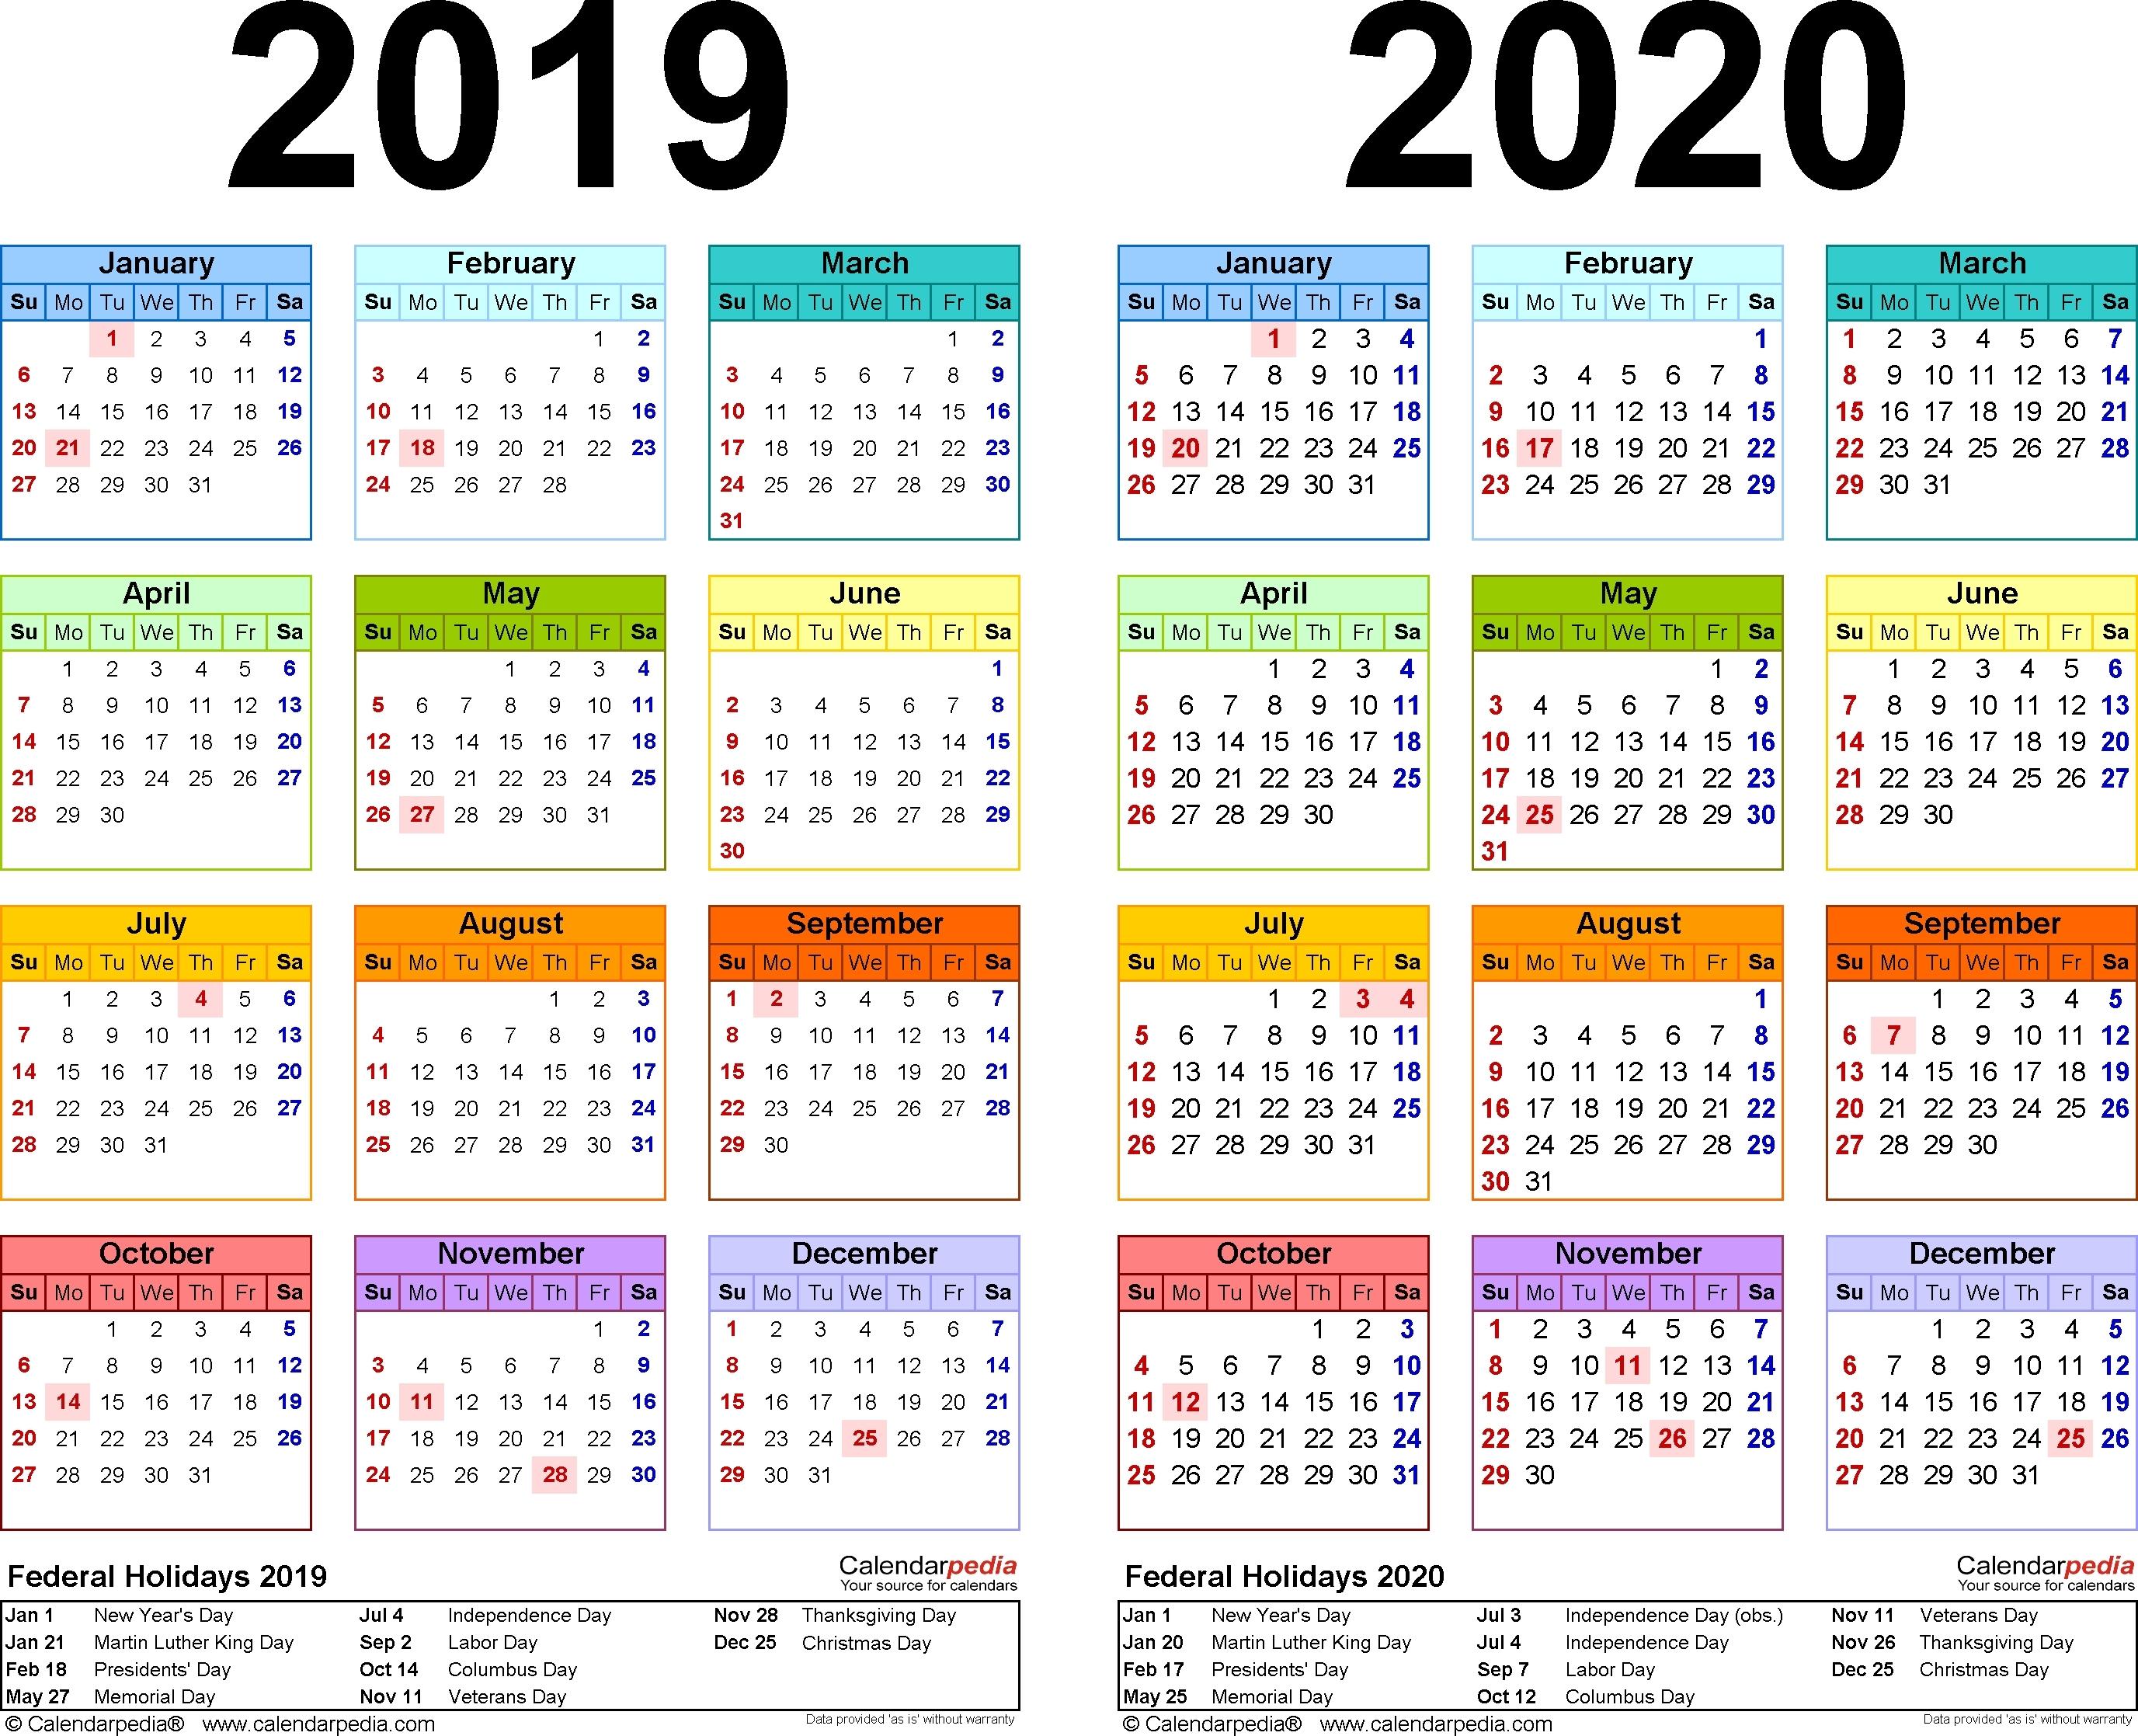 School Calendar And Holidays 2020   Calendar Design Ideas-Calender With Qld Holidays 2020 Printable